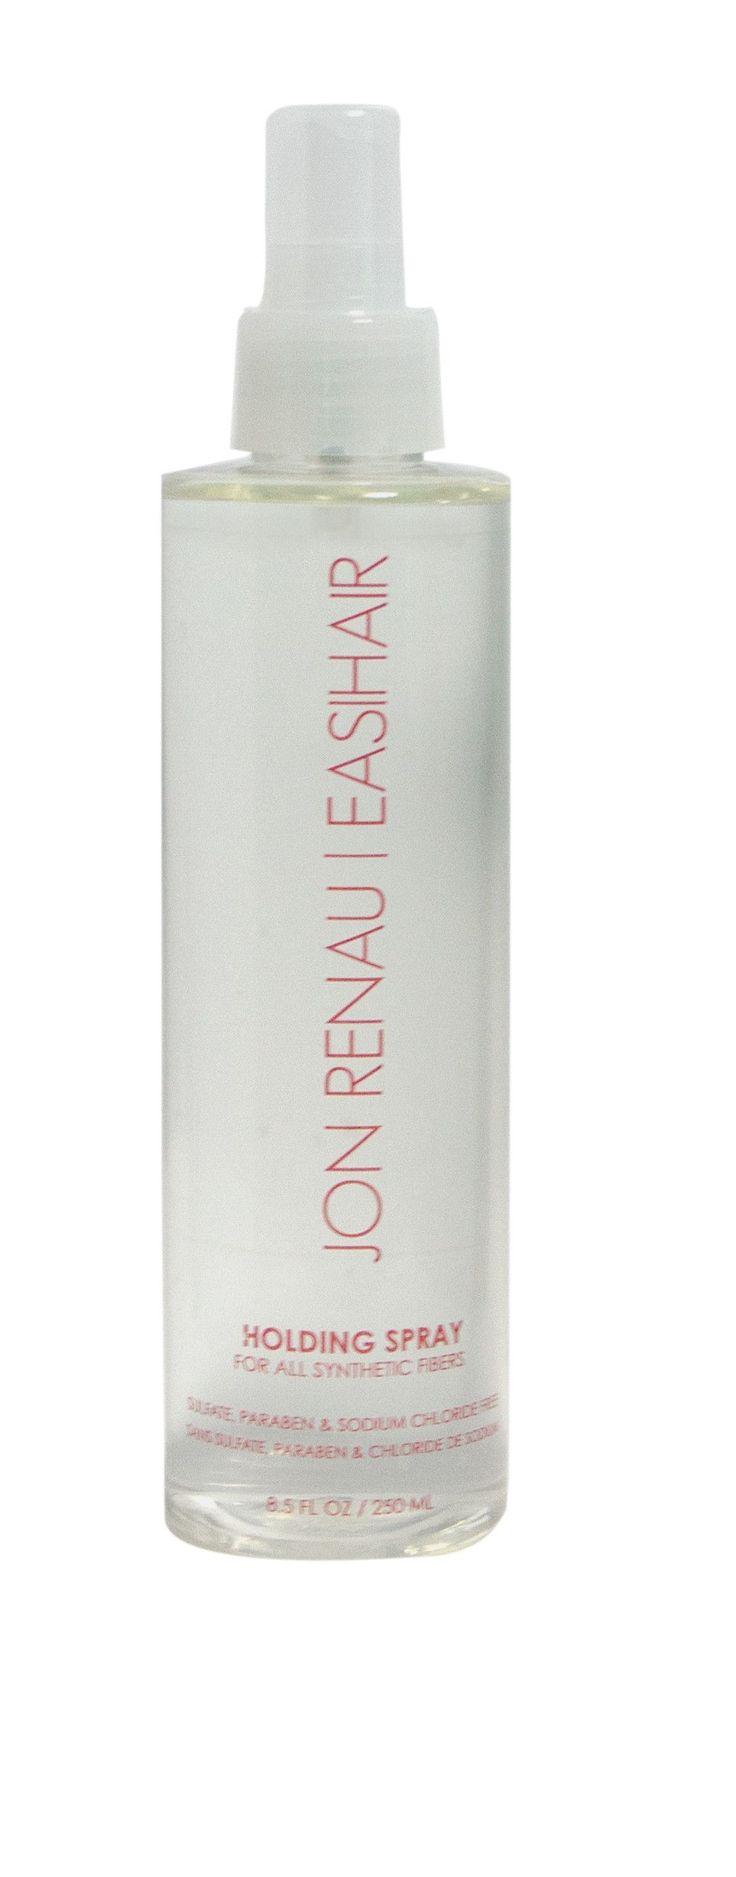 Jon Renau Holding Spray (8.5 oz)   Synthetic Hair Care